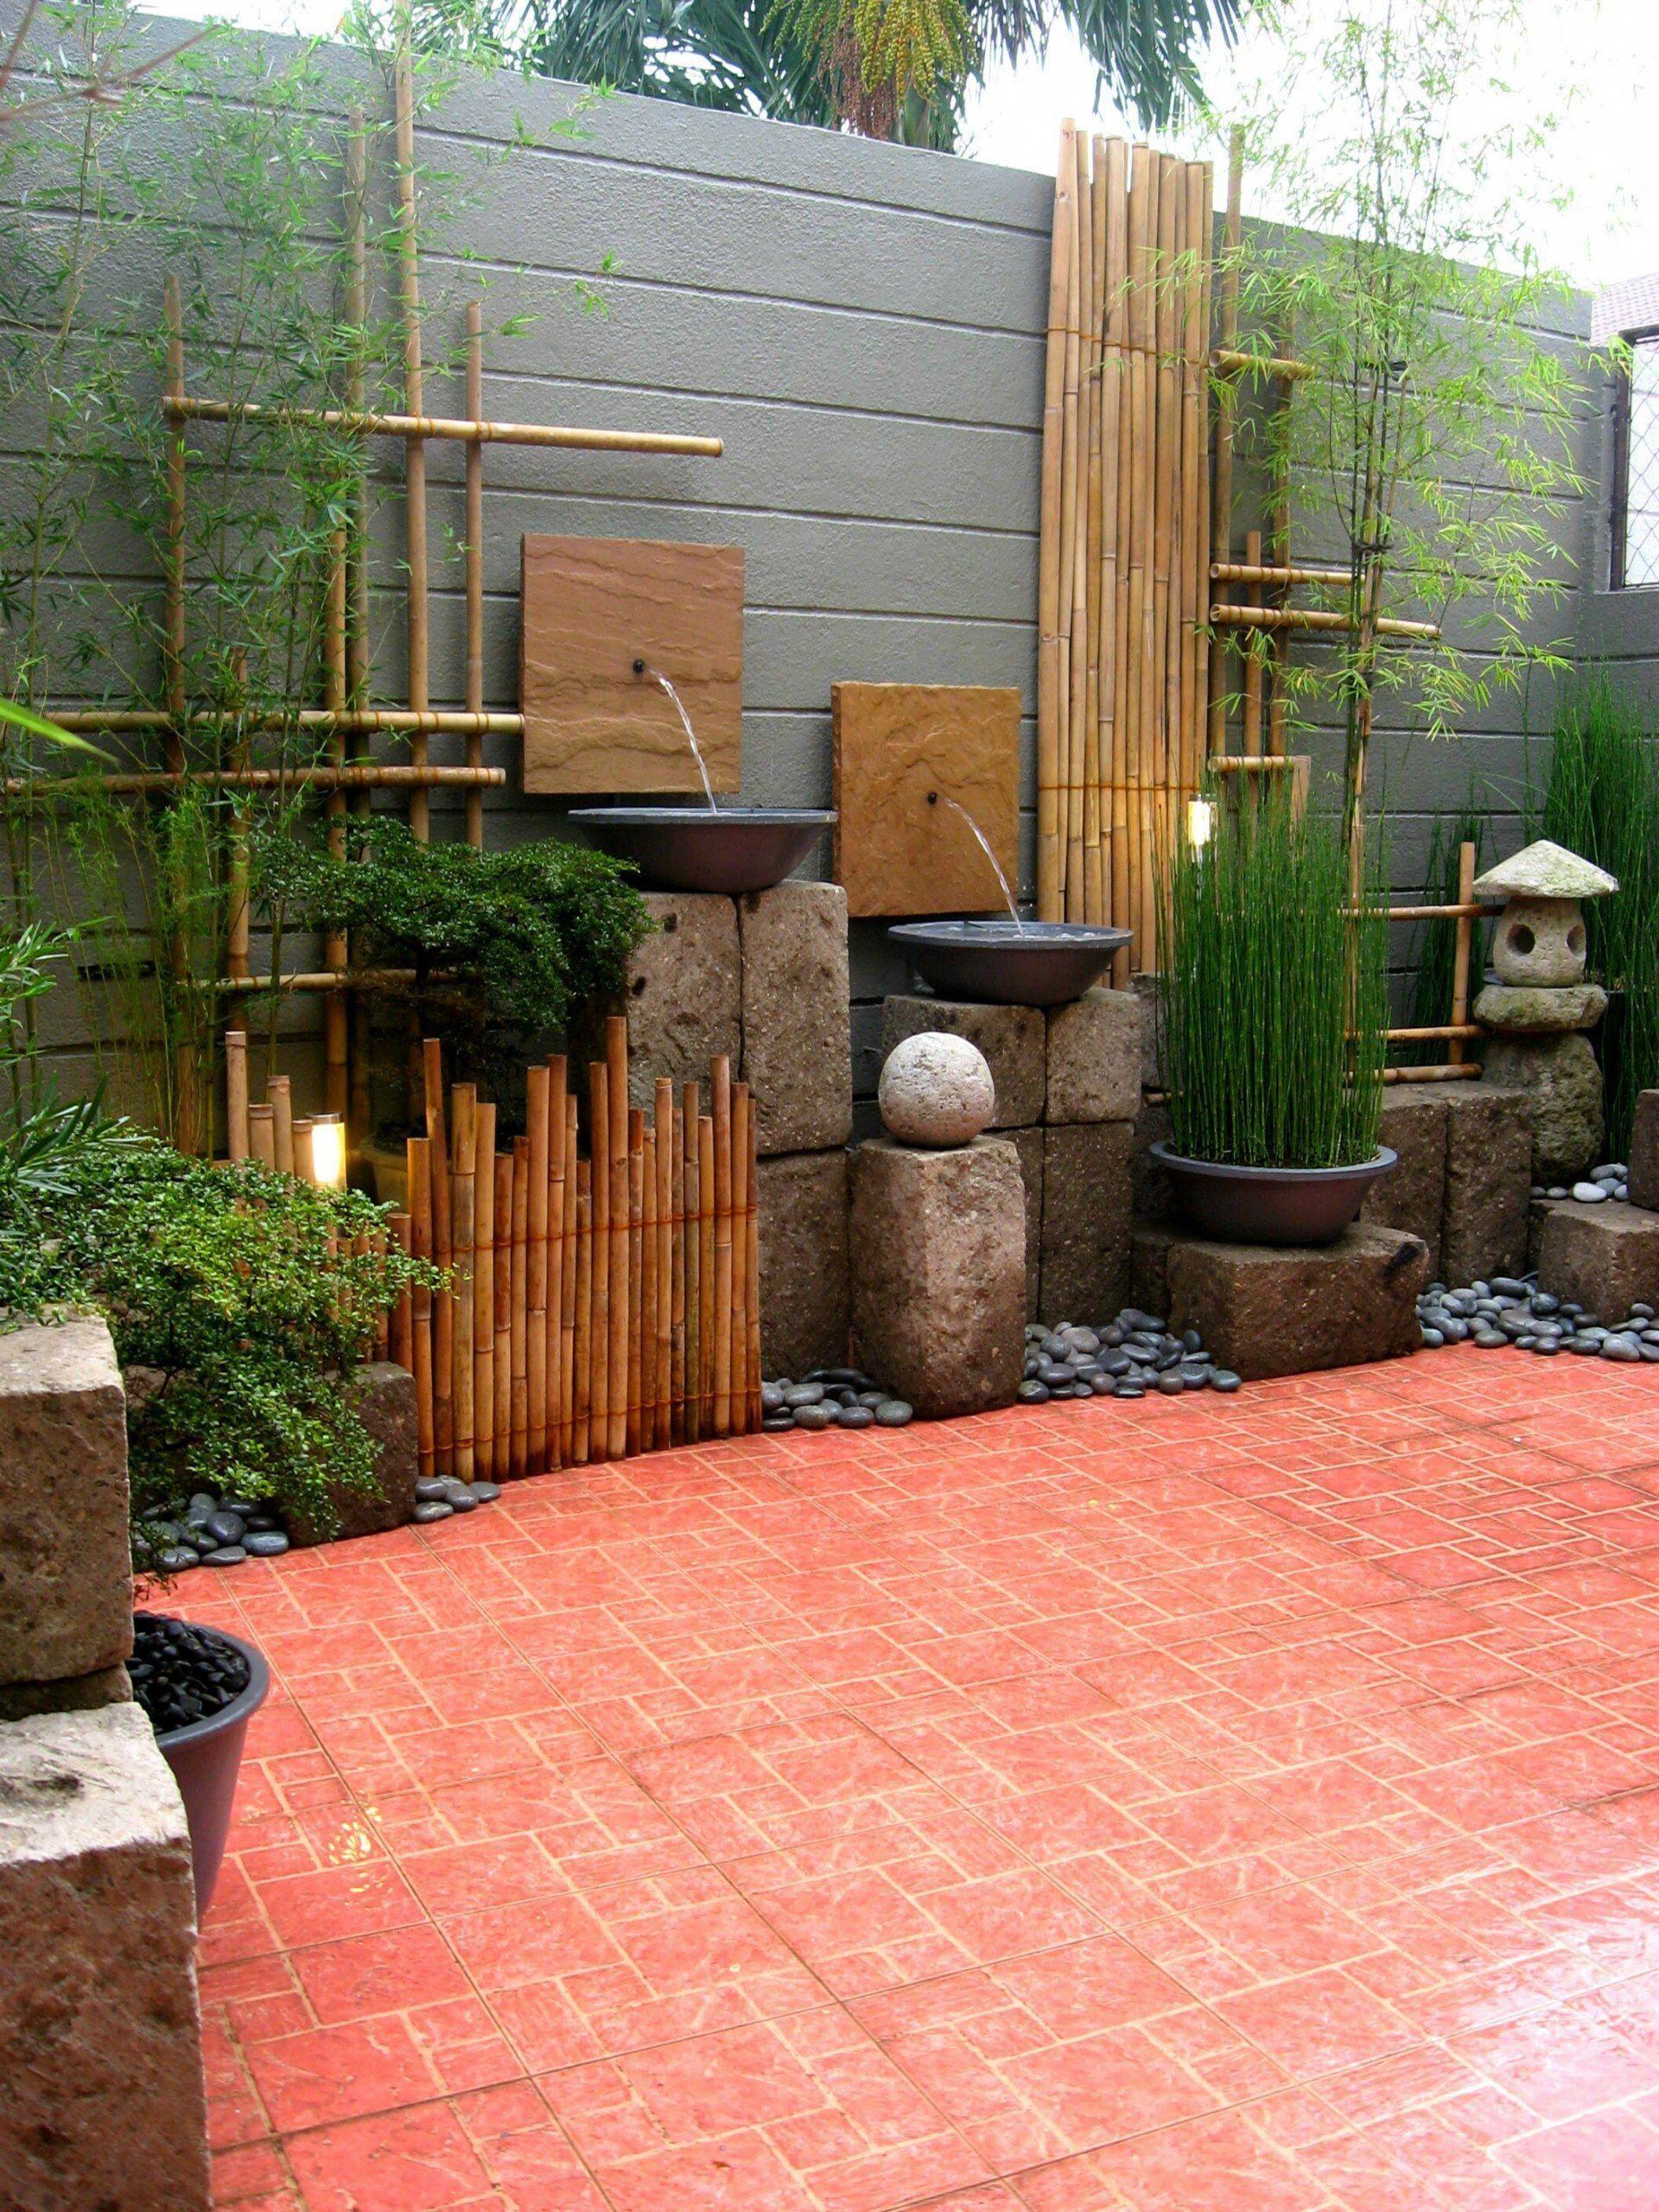 28+ Backyard design ideas in philippines ideas